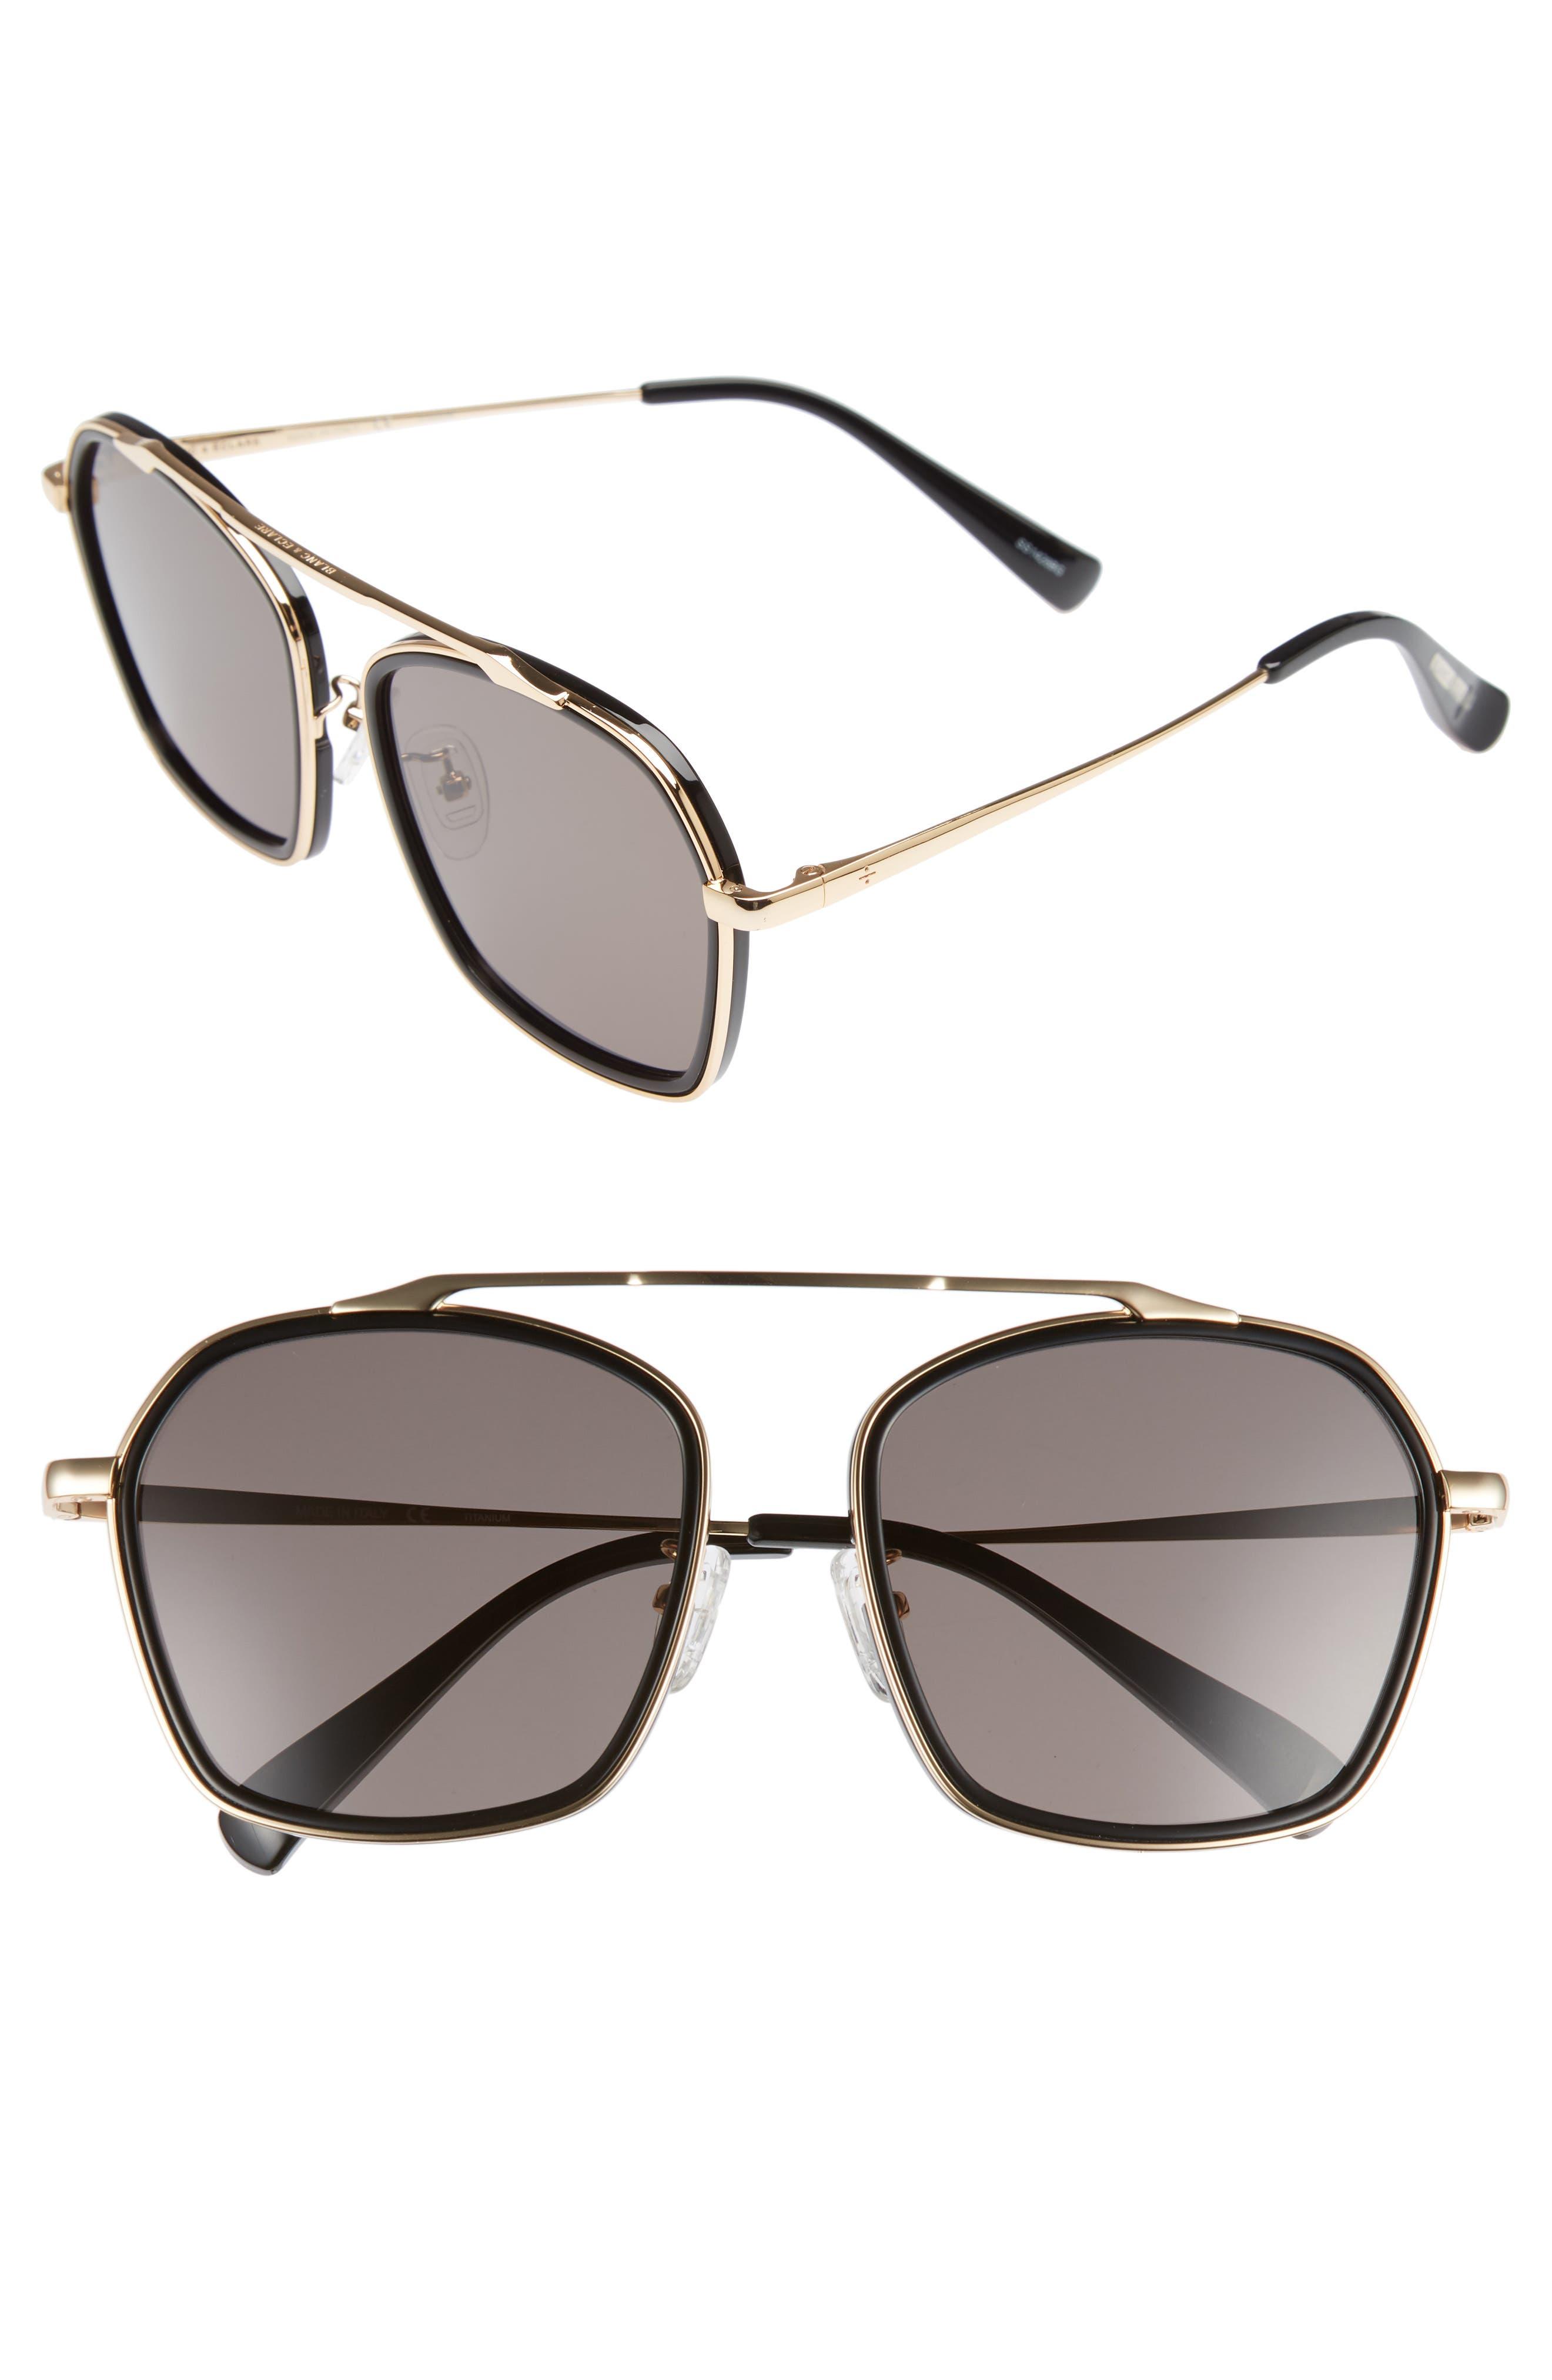 BLANC & ECLARE Vancouver 58mm Polarized Aviator Sunglasses,                             Main thumbnail 1, color,                             BLACK/ GOLD/ SMOG GREY